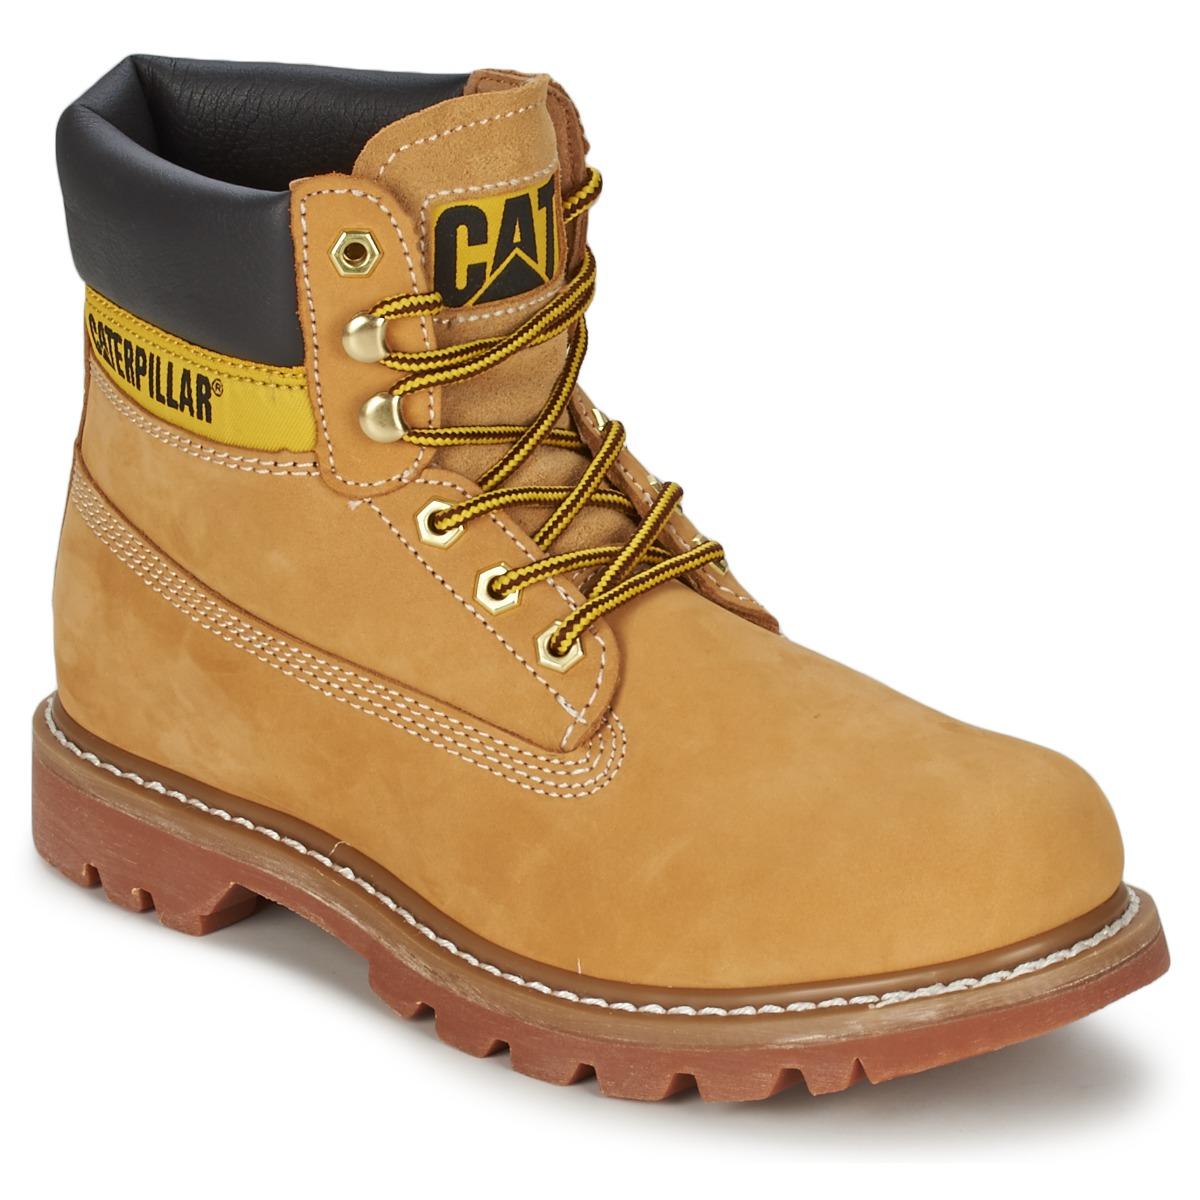 Boots caterpillar colorado miel livraison gratuite avec chaussures femme 111 92 - Chaussure homme caterpillar ...